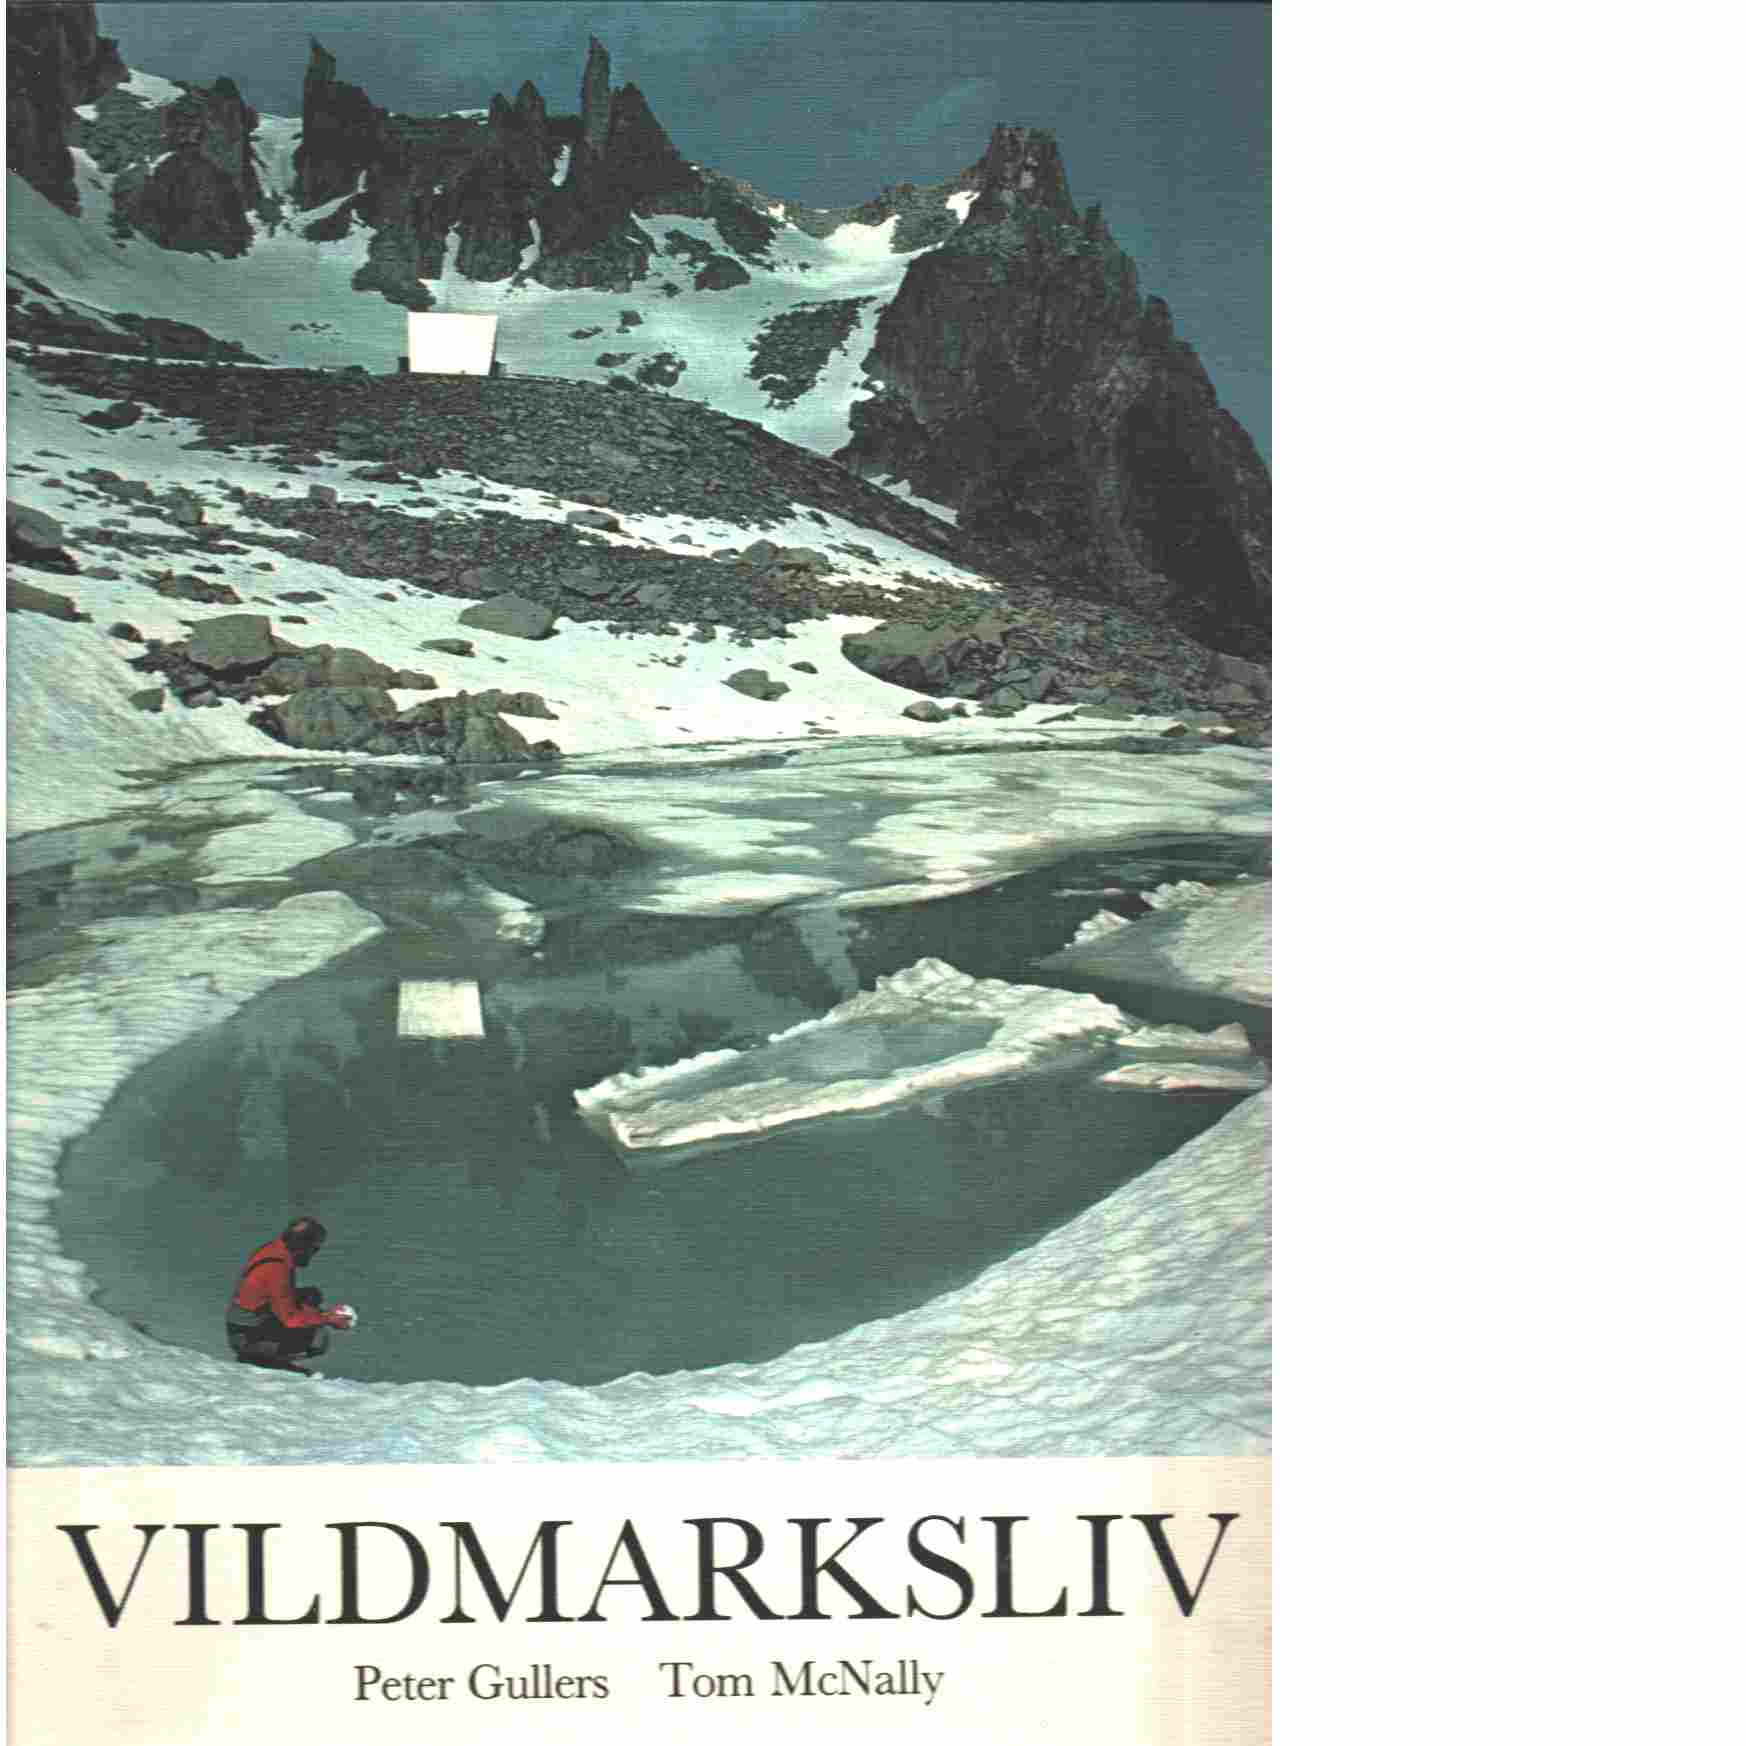 Vildmarksliv / Joy of the wild - Gullers, Peter och McNally, Tom